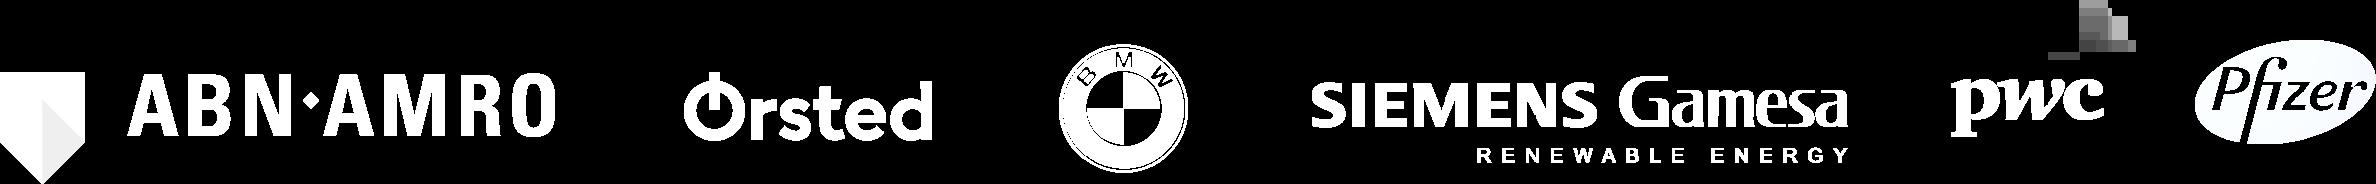 customer logos in line png